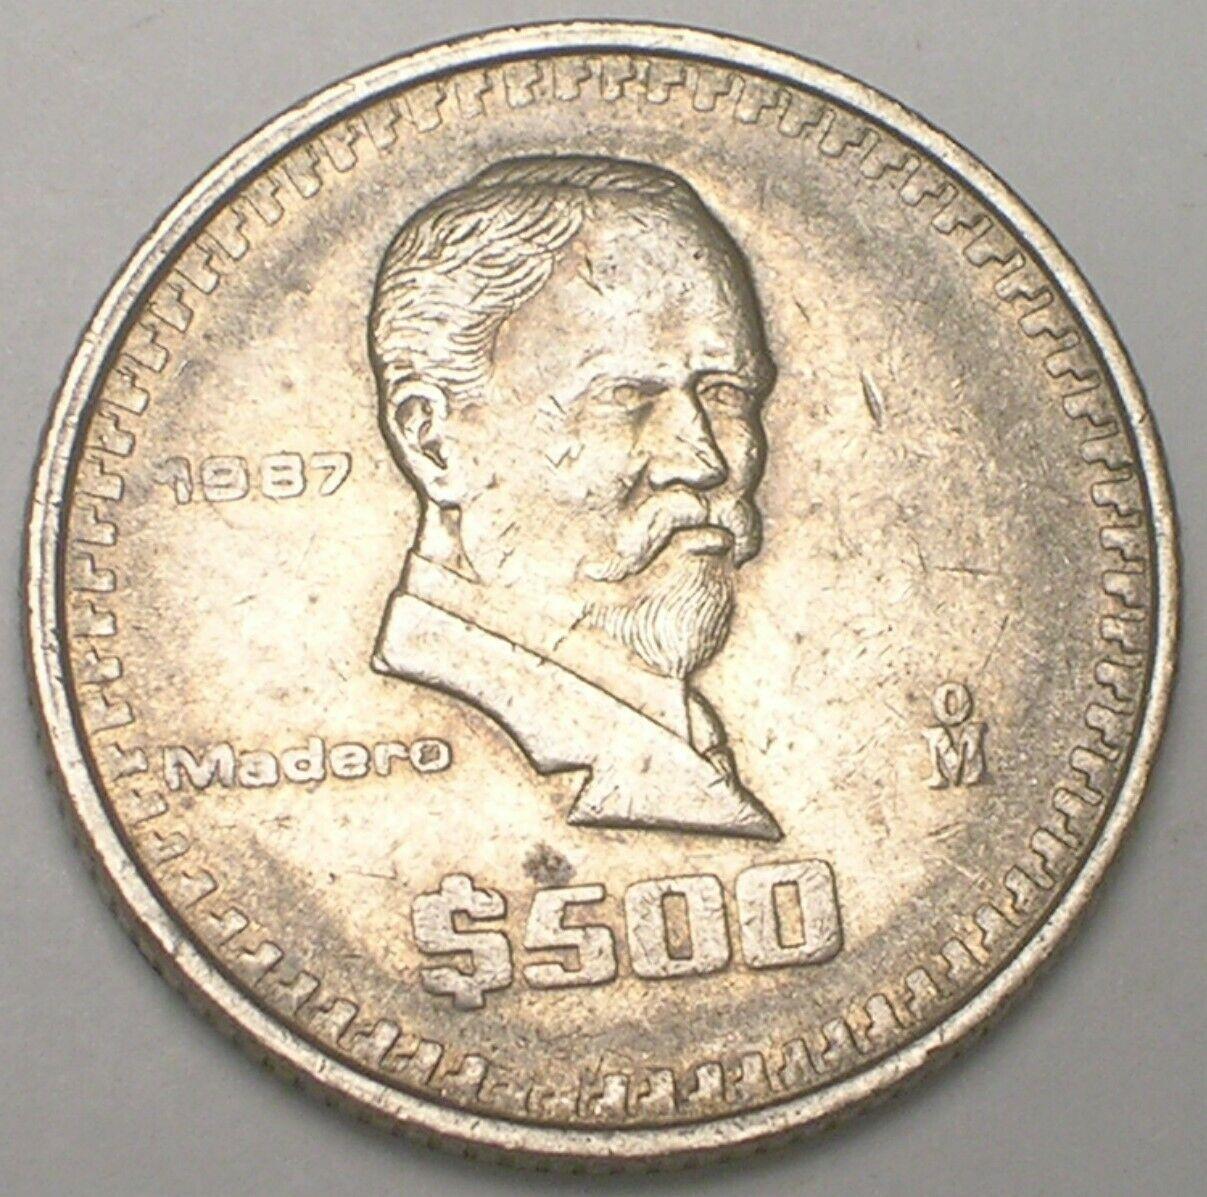 "1987 MEXICO $500 PESOS vintage /""Madero/"" coin BU UNC"